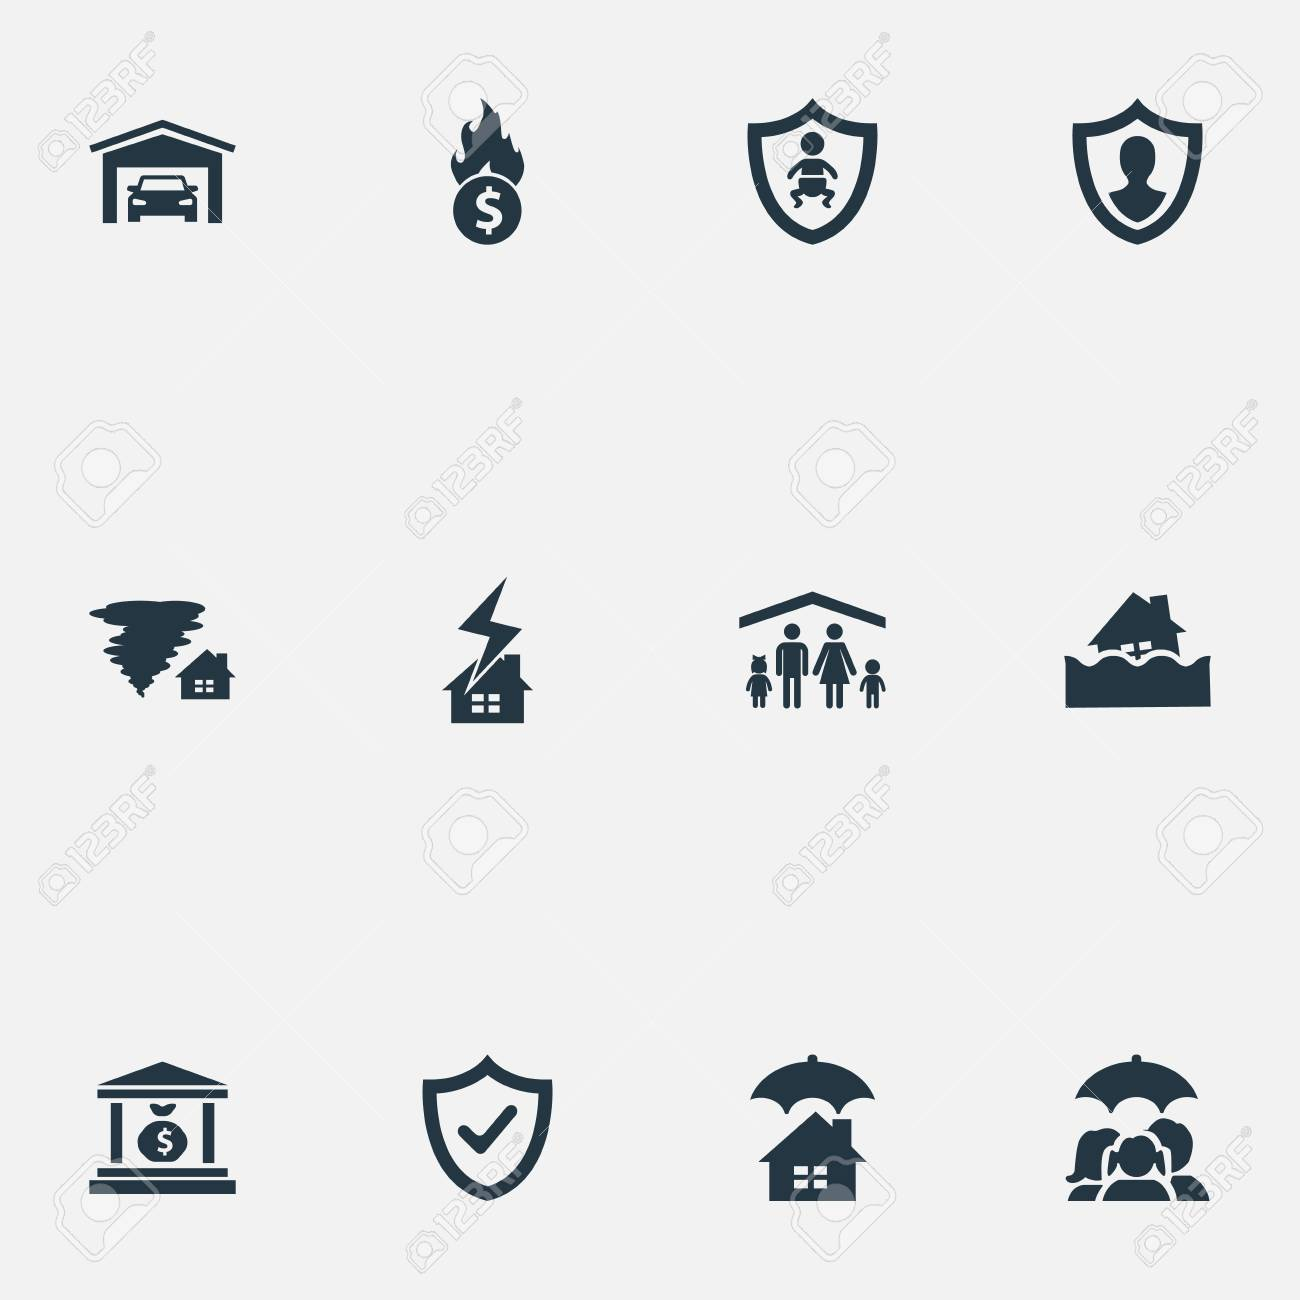 vector illustration set of simple insurance icons elements vehicle rh 123rf com Vector Graphics Torrent Vector Magic Torrent